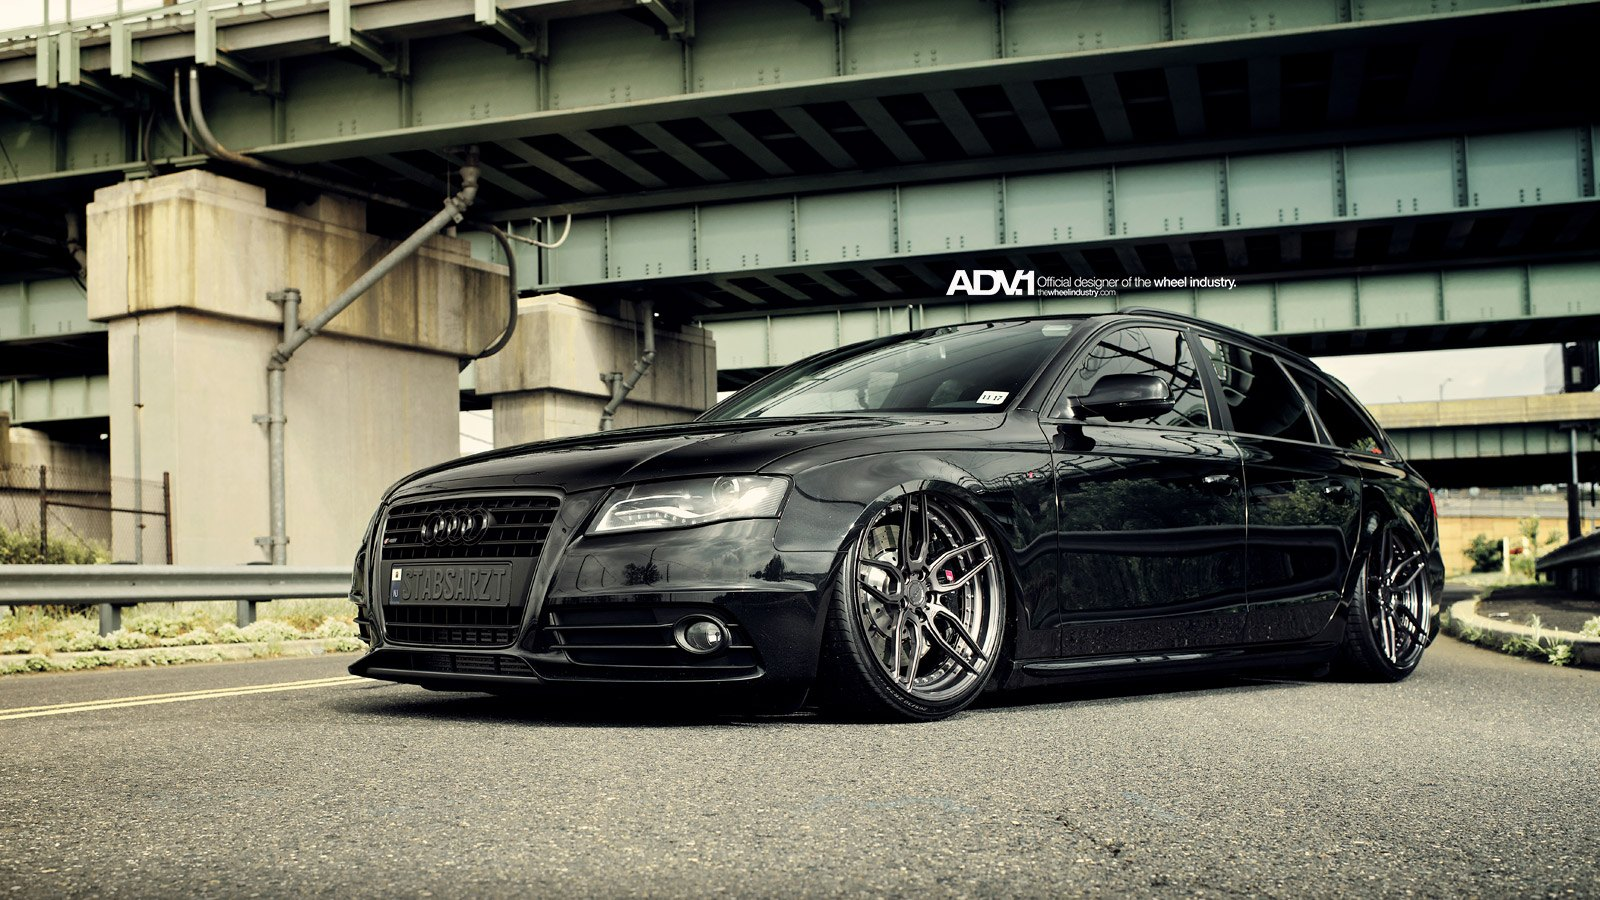 Black Lowered Audi A4 With Dark Smoke Led Headlights Photo By Adv 1